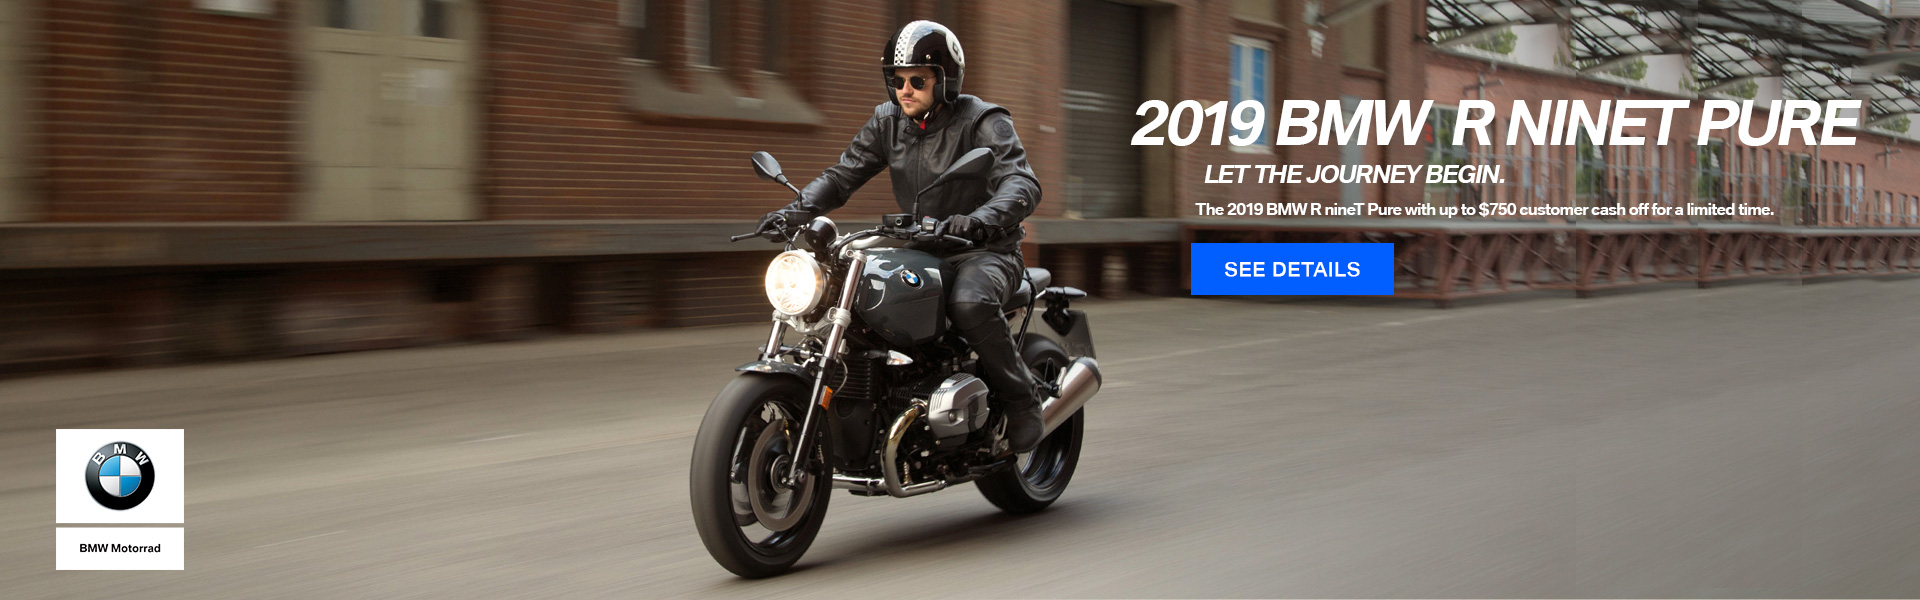 2019 BMW RnineT Pure